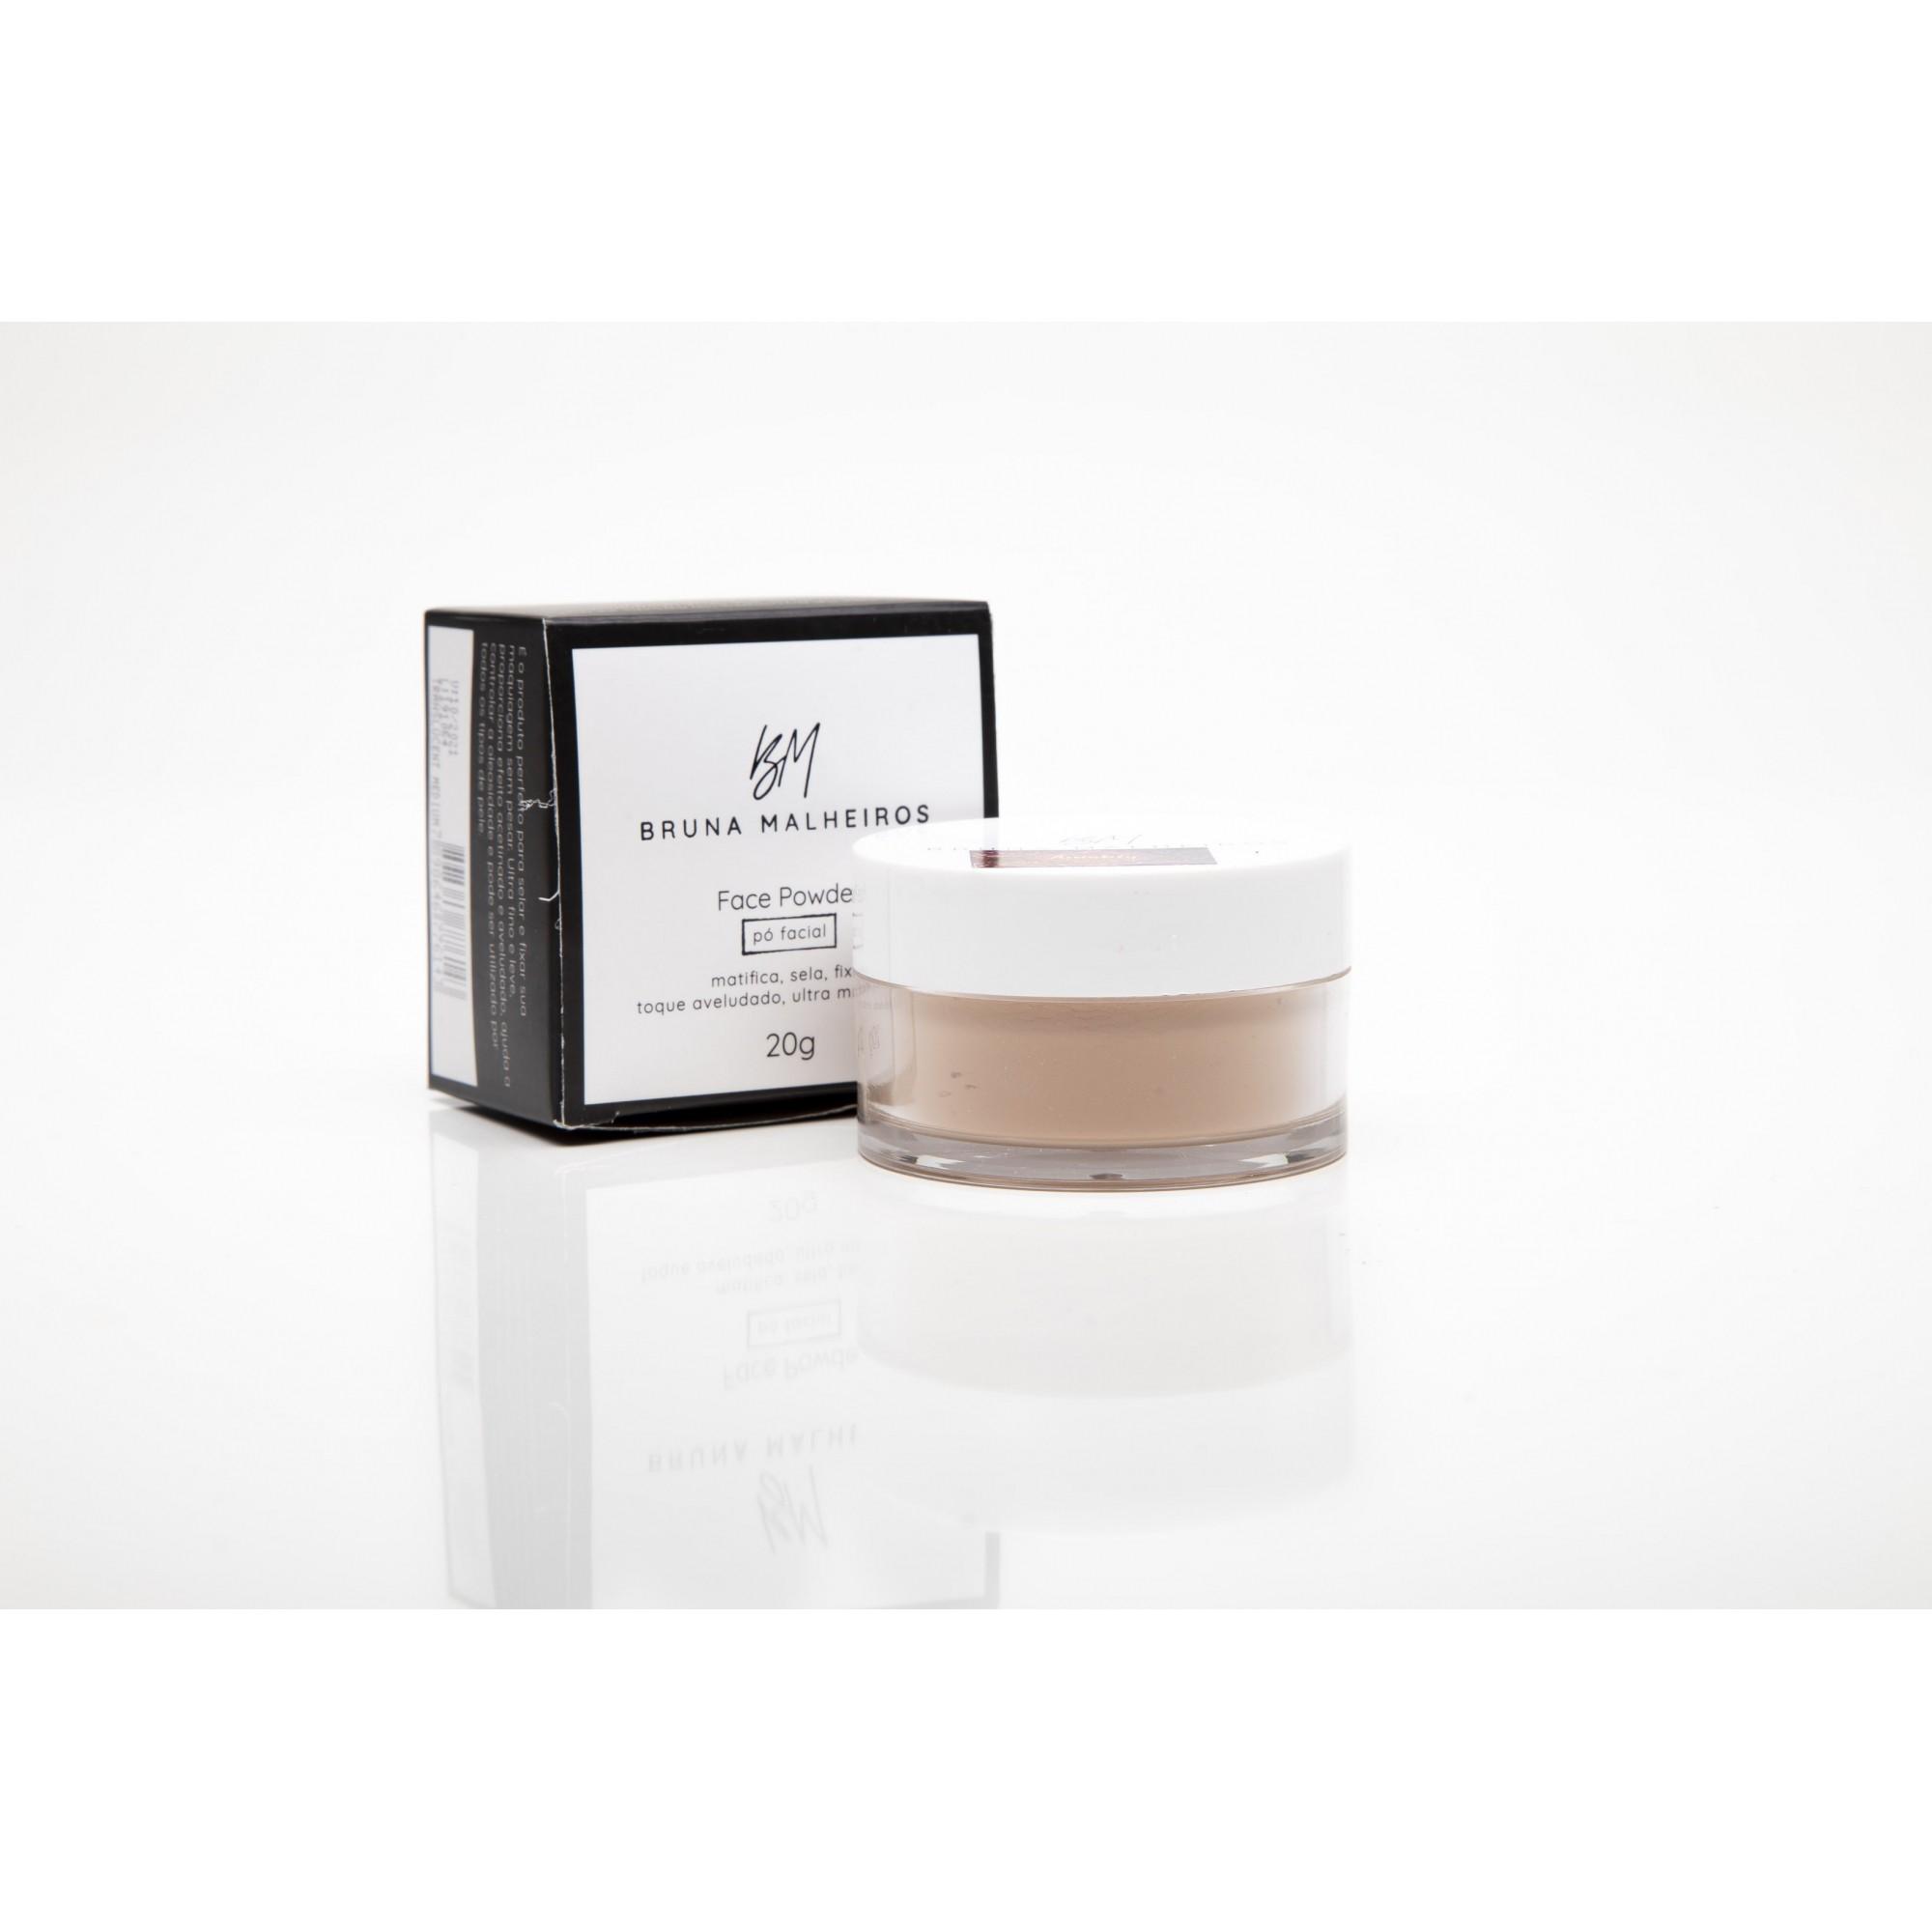 Face powder - pó facial traslucent medium